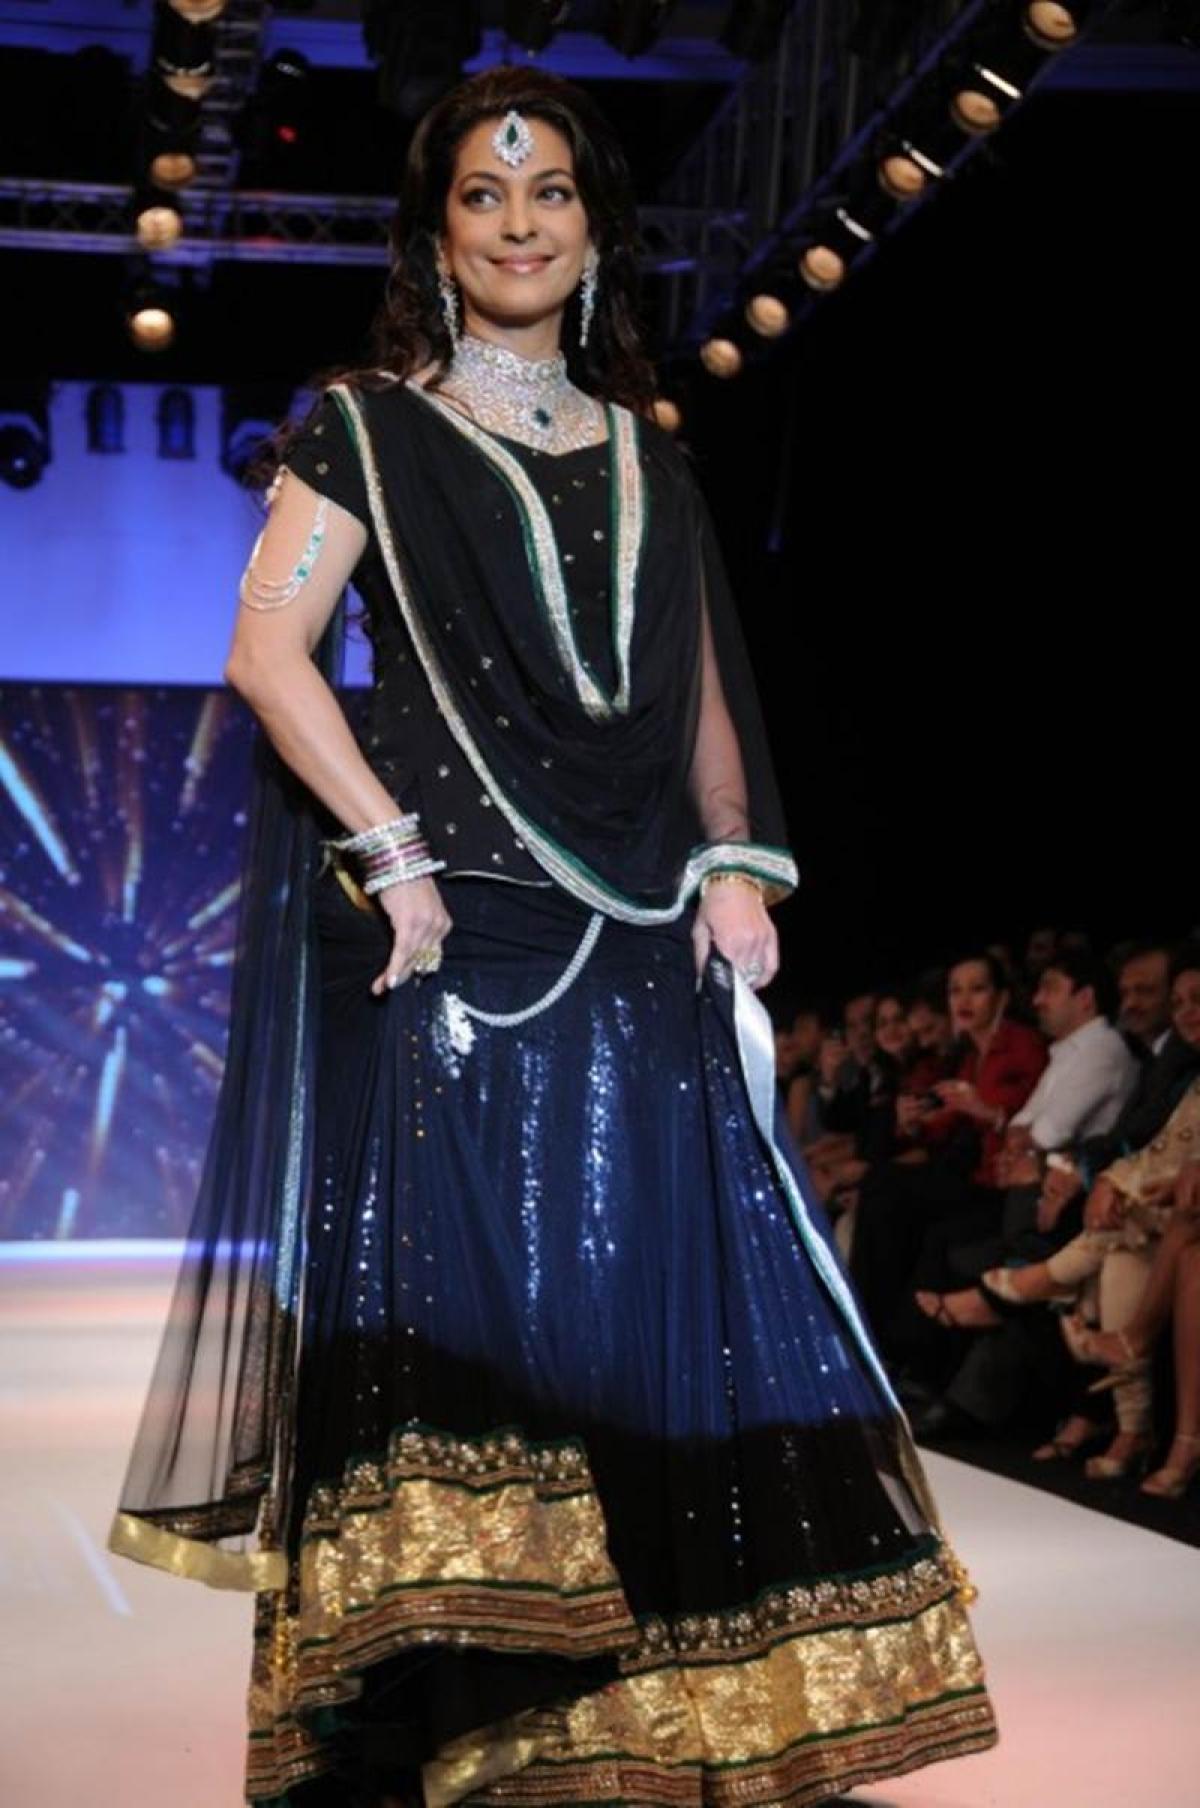 Celeb Fashion: Wear whatever makes you happy, says Juhi Chawla